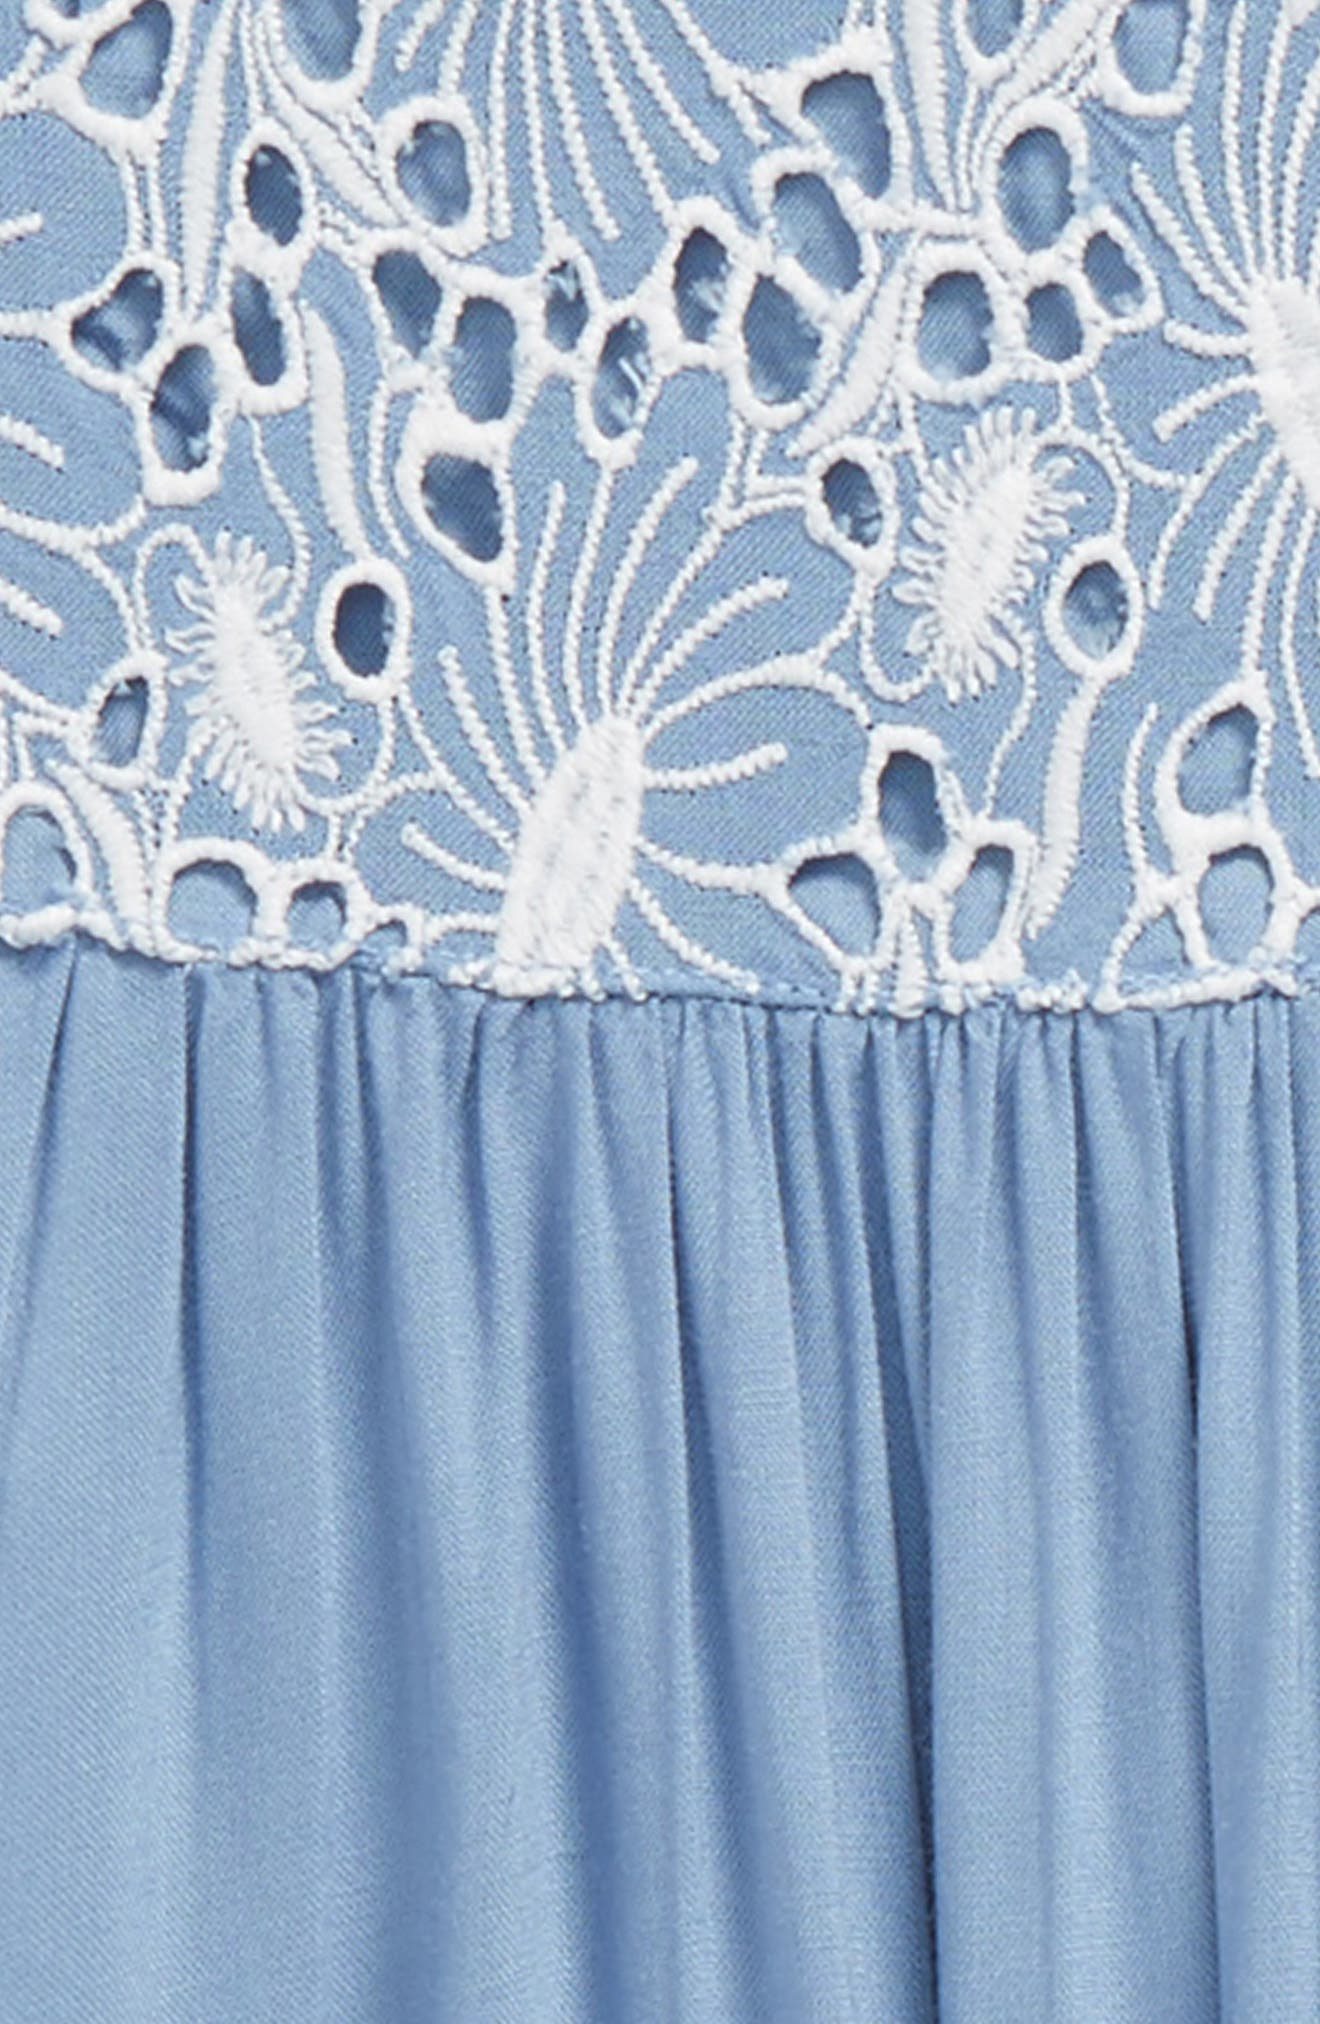 Embroidered Tassel Dress,                             Alternate thumbnail 3, color,                             420